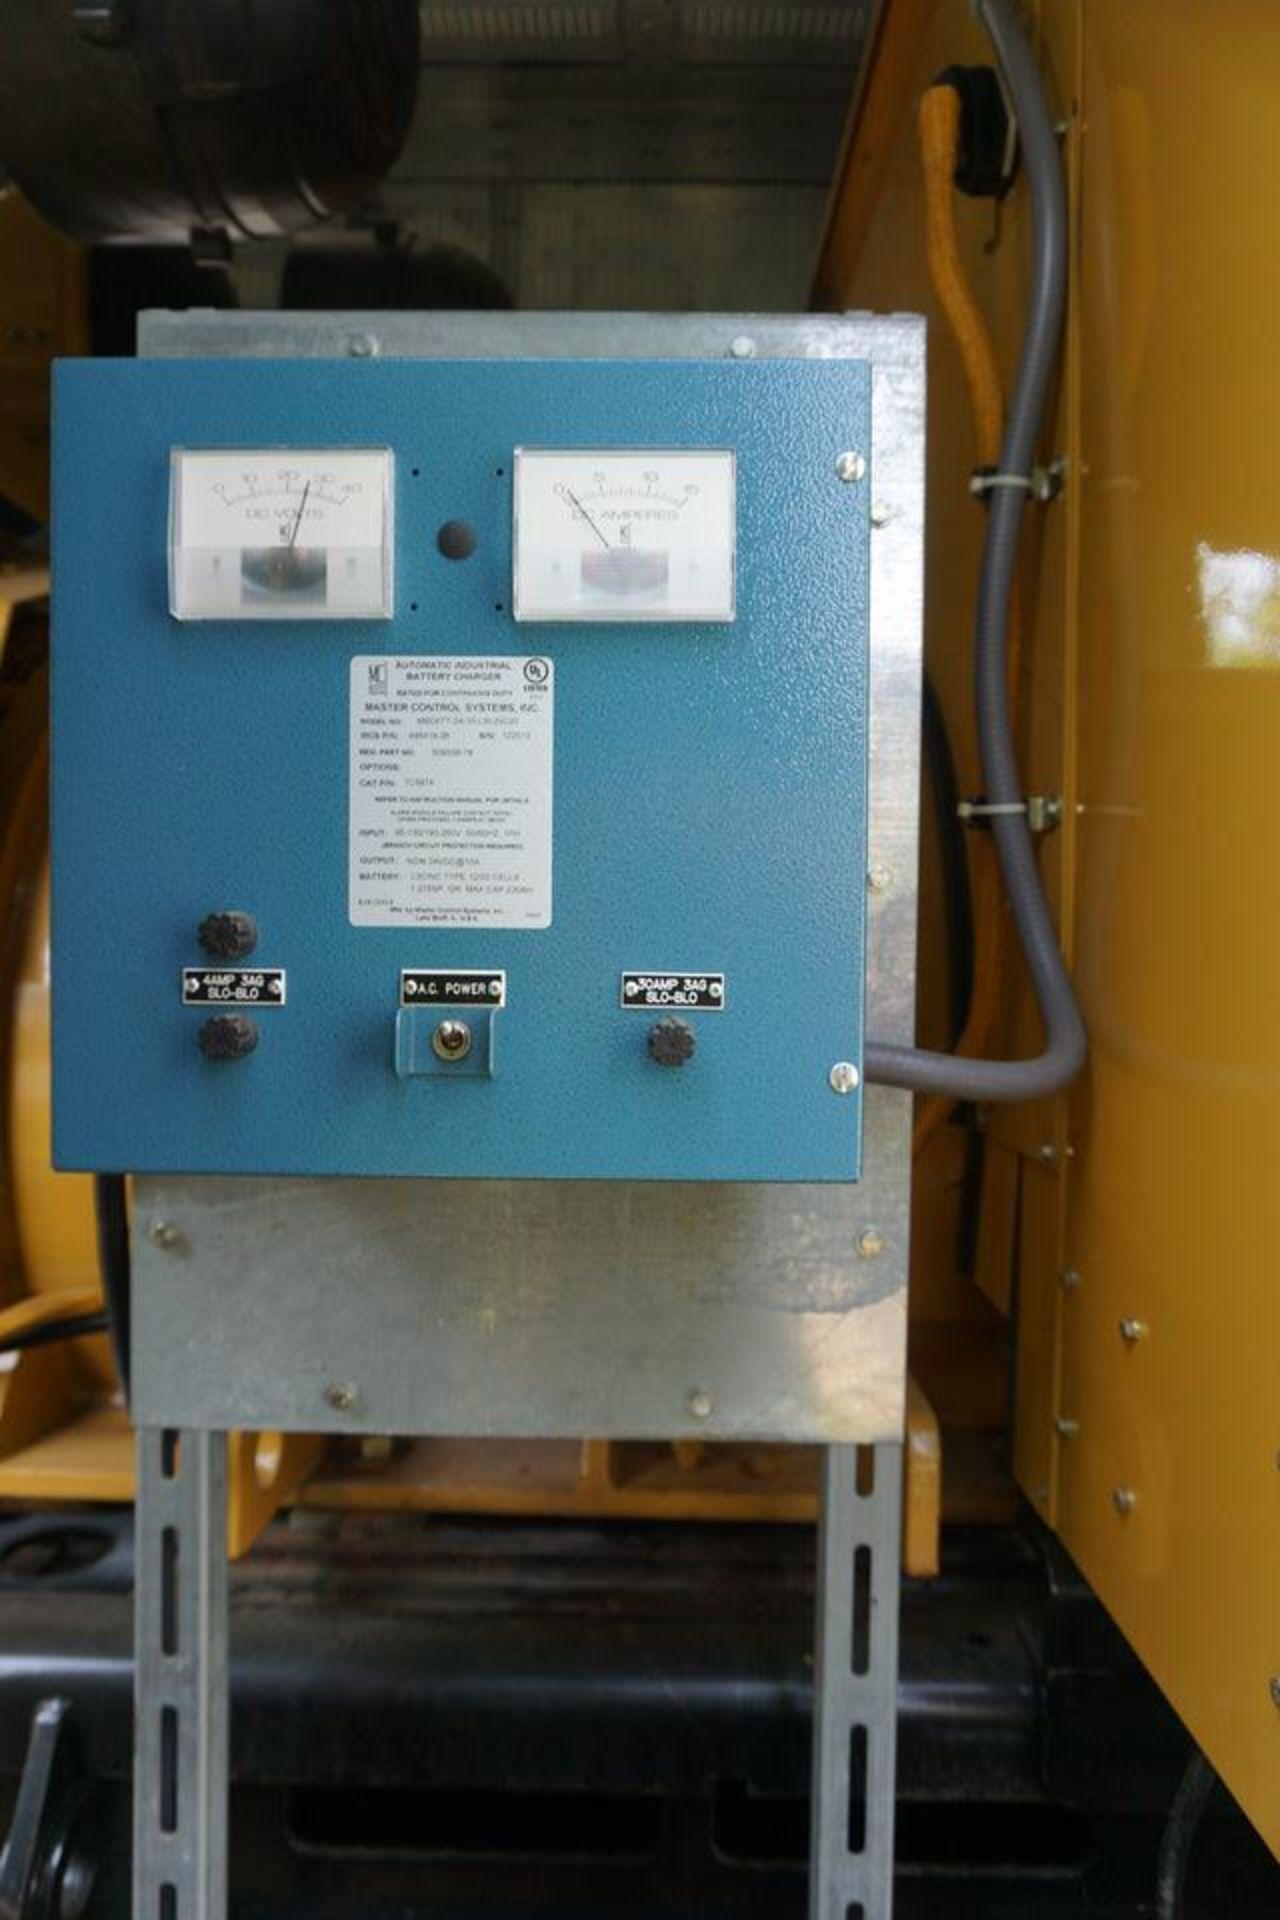 2007 CATERPILLAR BACK UP GENERATOR, ENGINE MODEL: C32 W/ EMCP3.3 CONTROL, 173.9 HOURS, 1250 KVA - Image 12 of 25